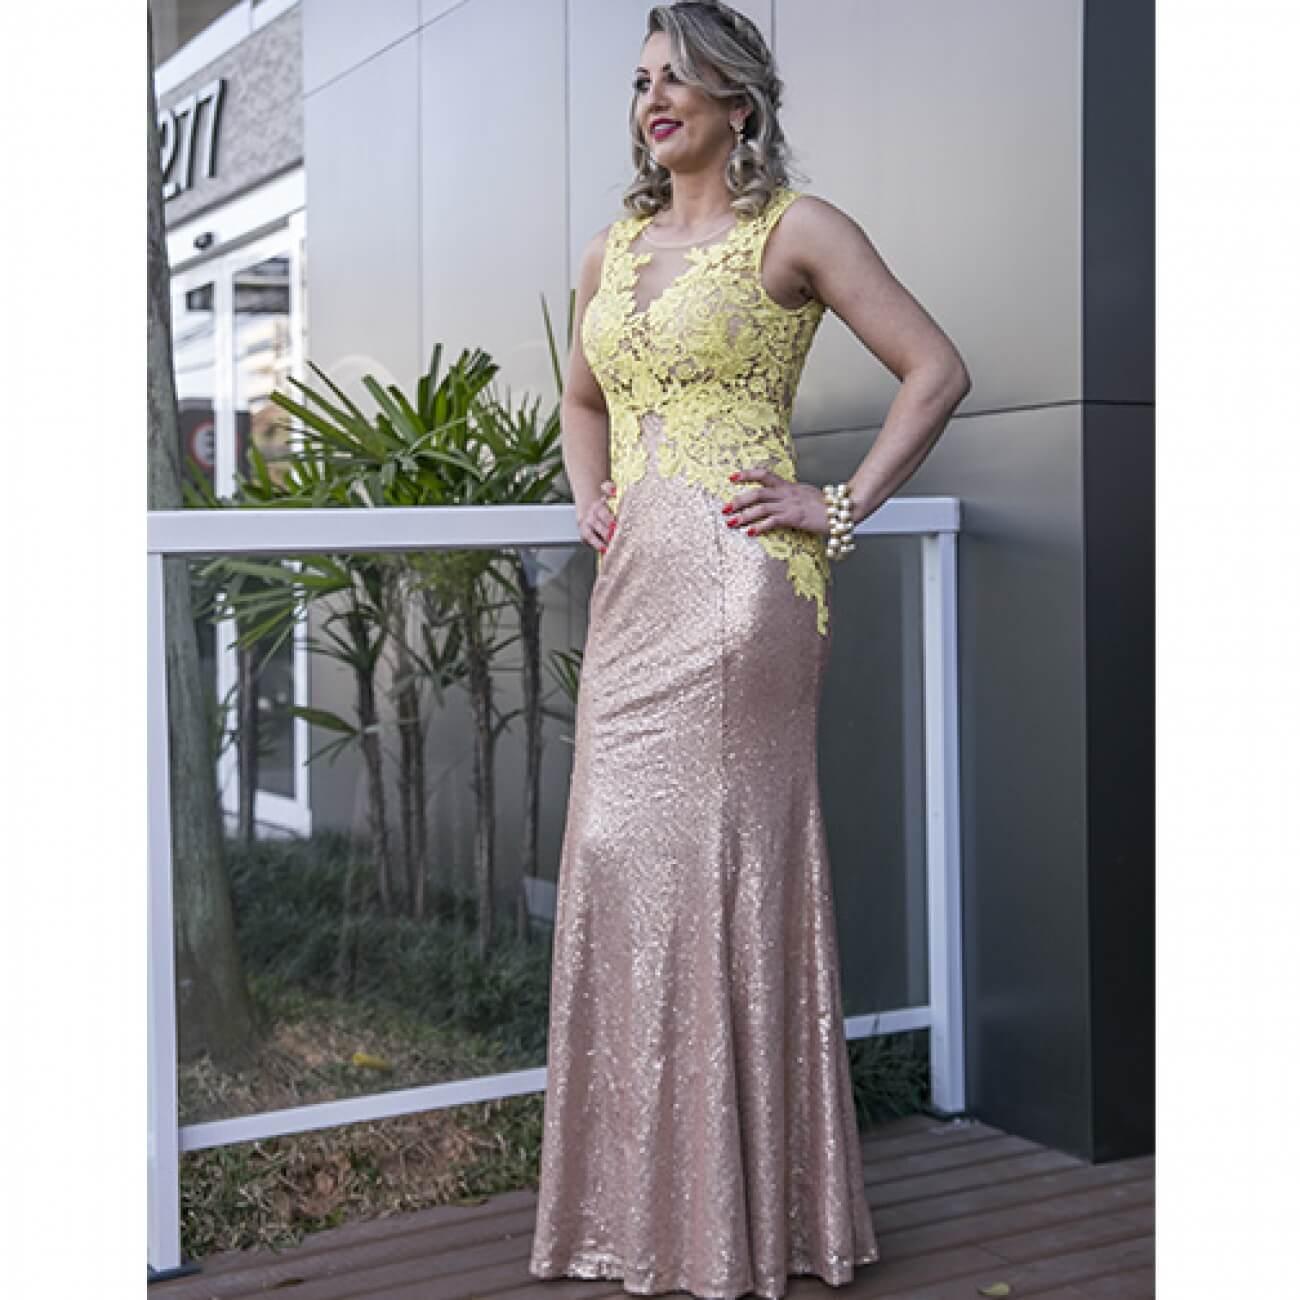 eb2318073 Vestido de Festa Longo com Paetês e Renda Adoro - Cor Amarelo - Pole ...